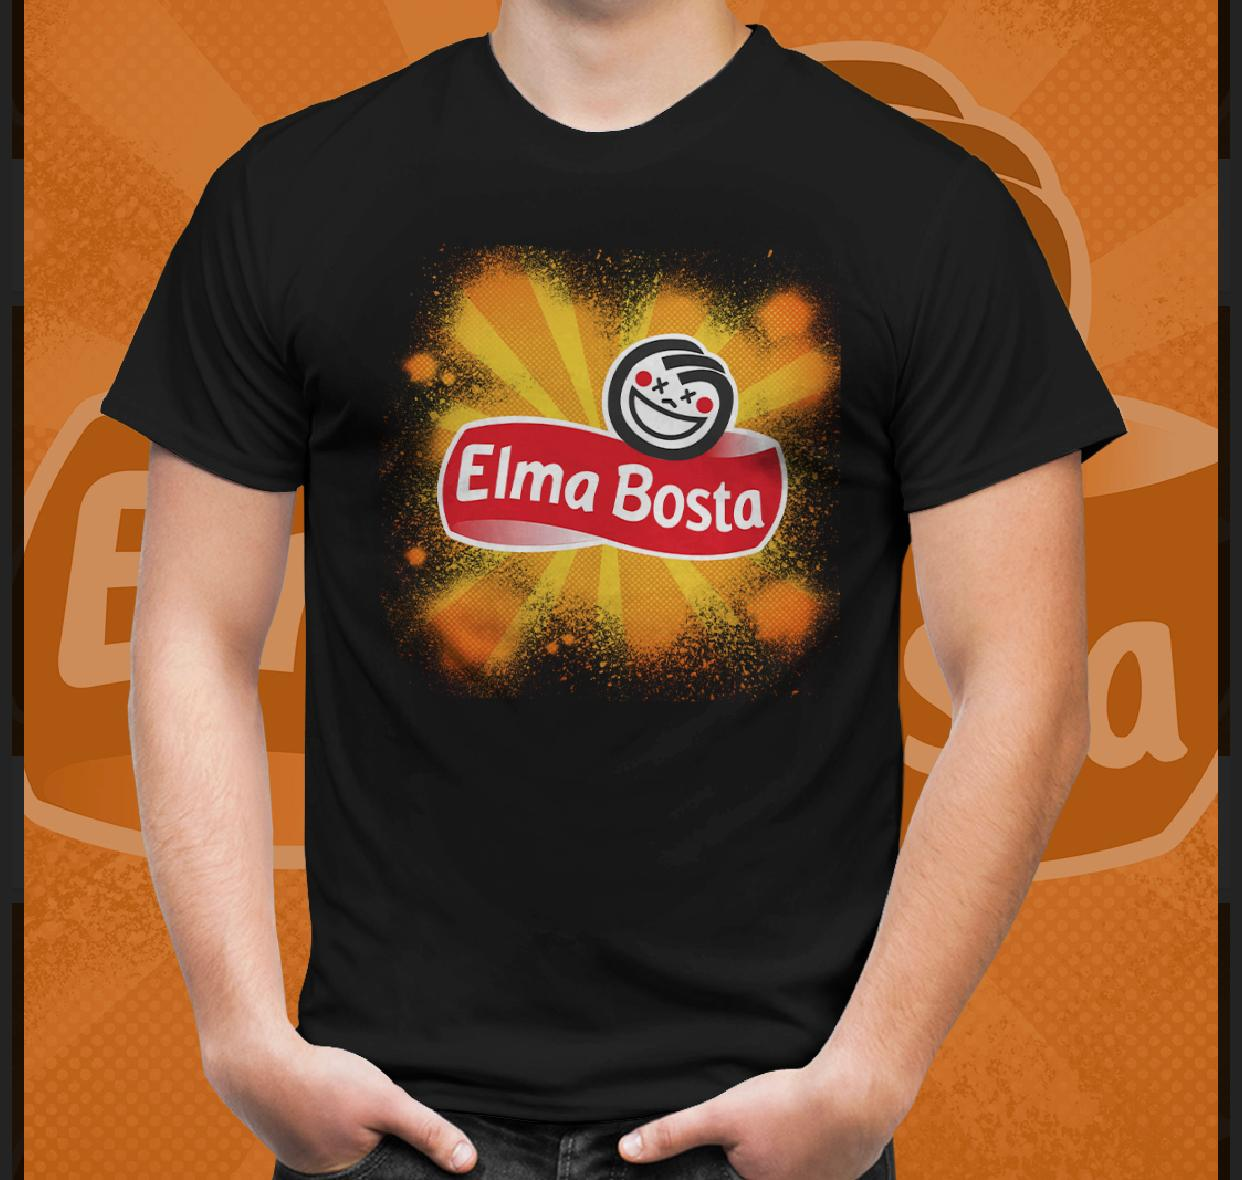 Camiseta Elma Bosta (Preto)